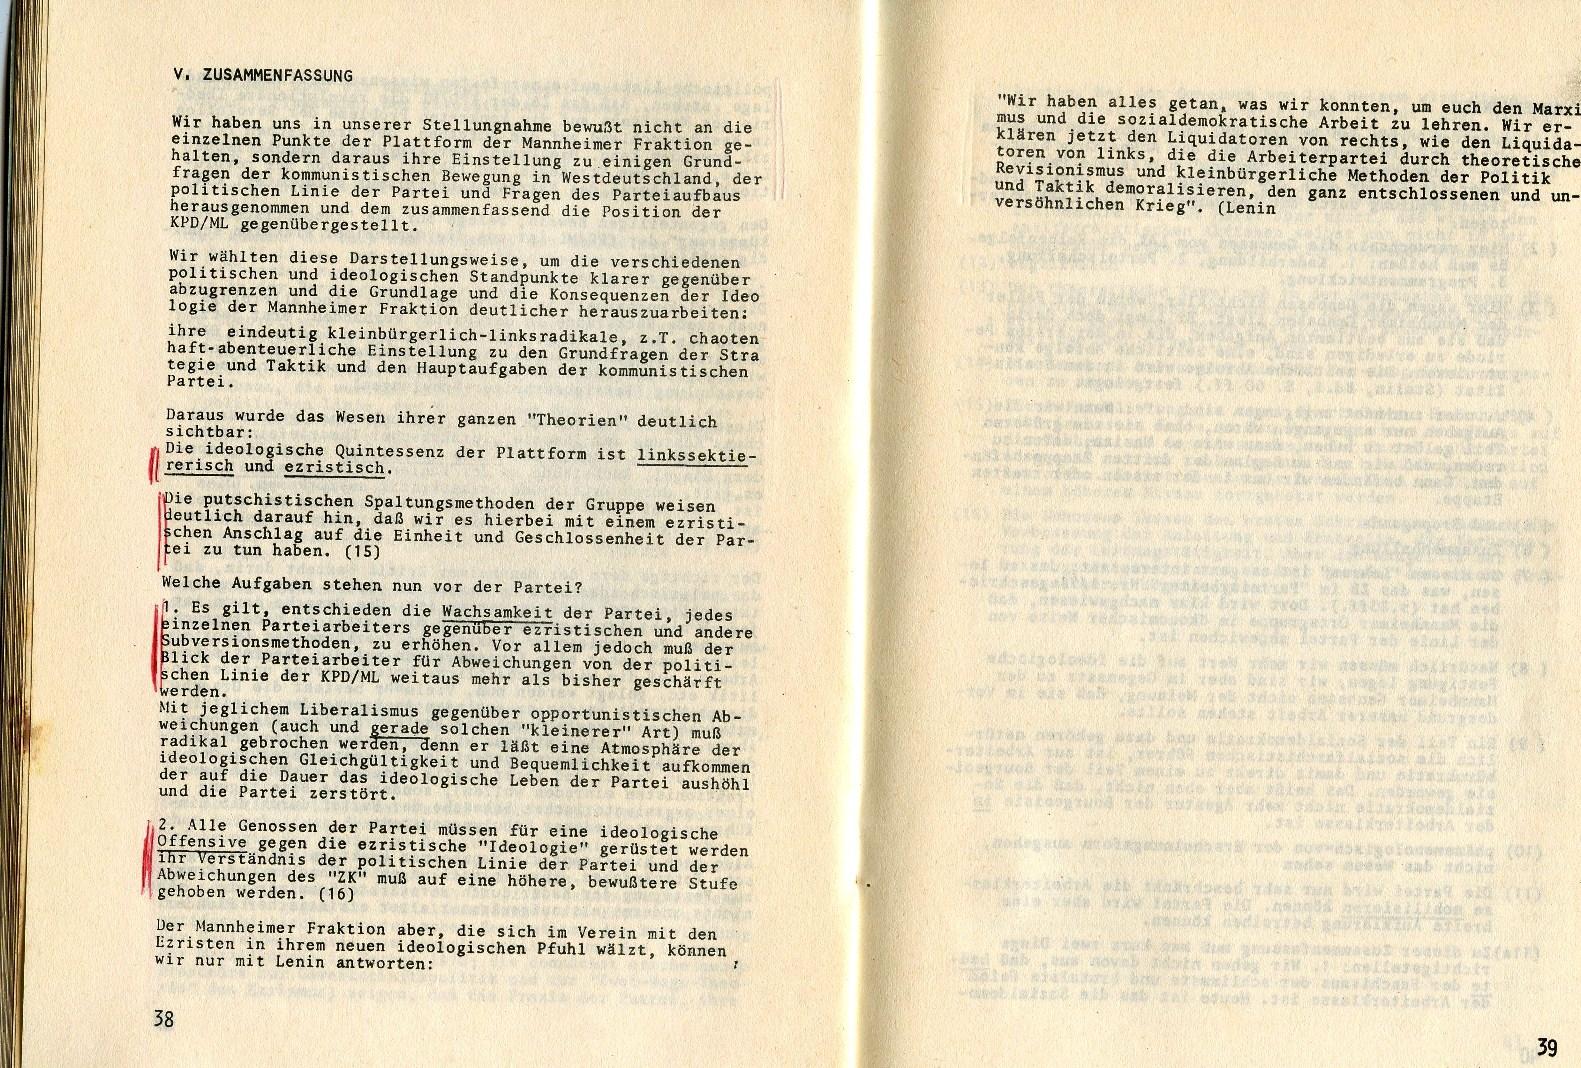 ZB_Parteiarbeiter_1971_05_21